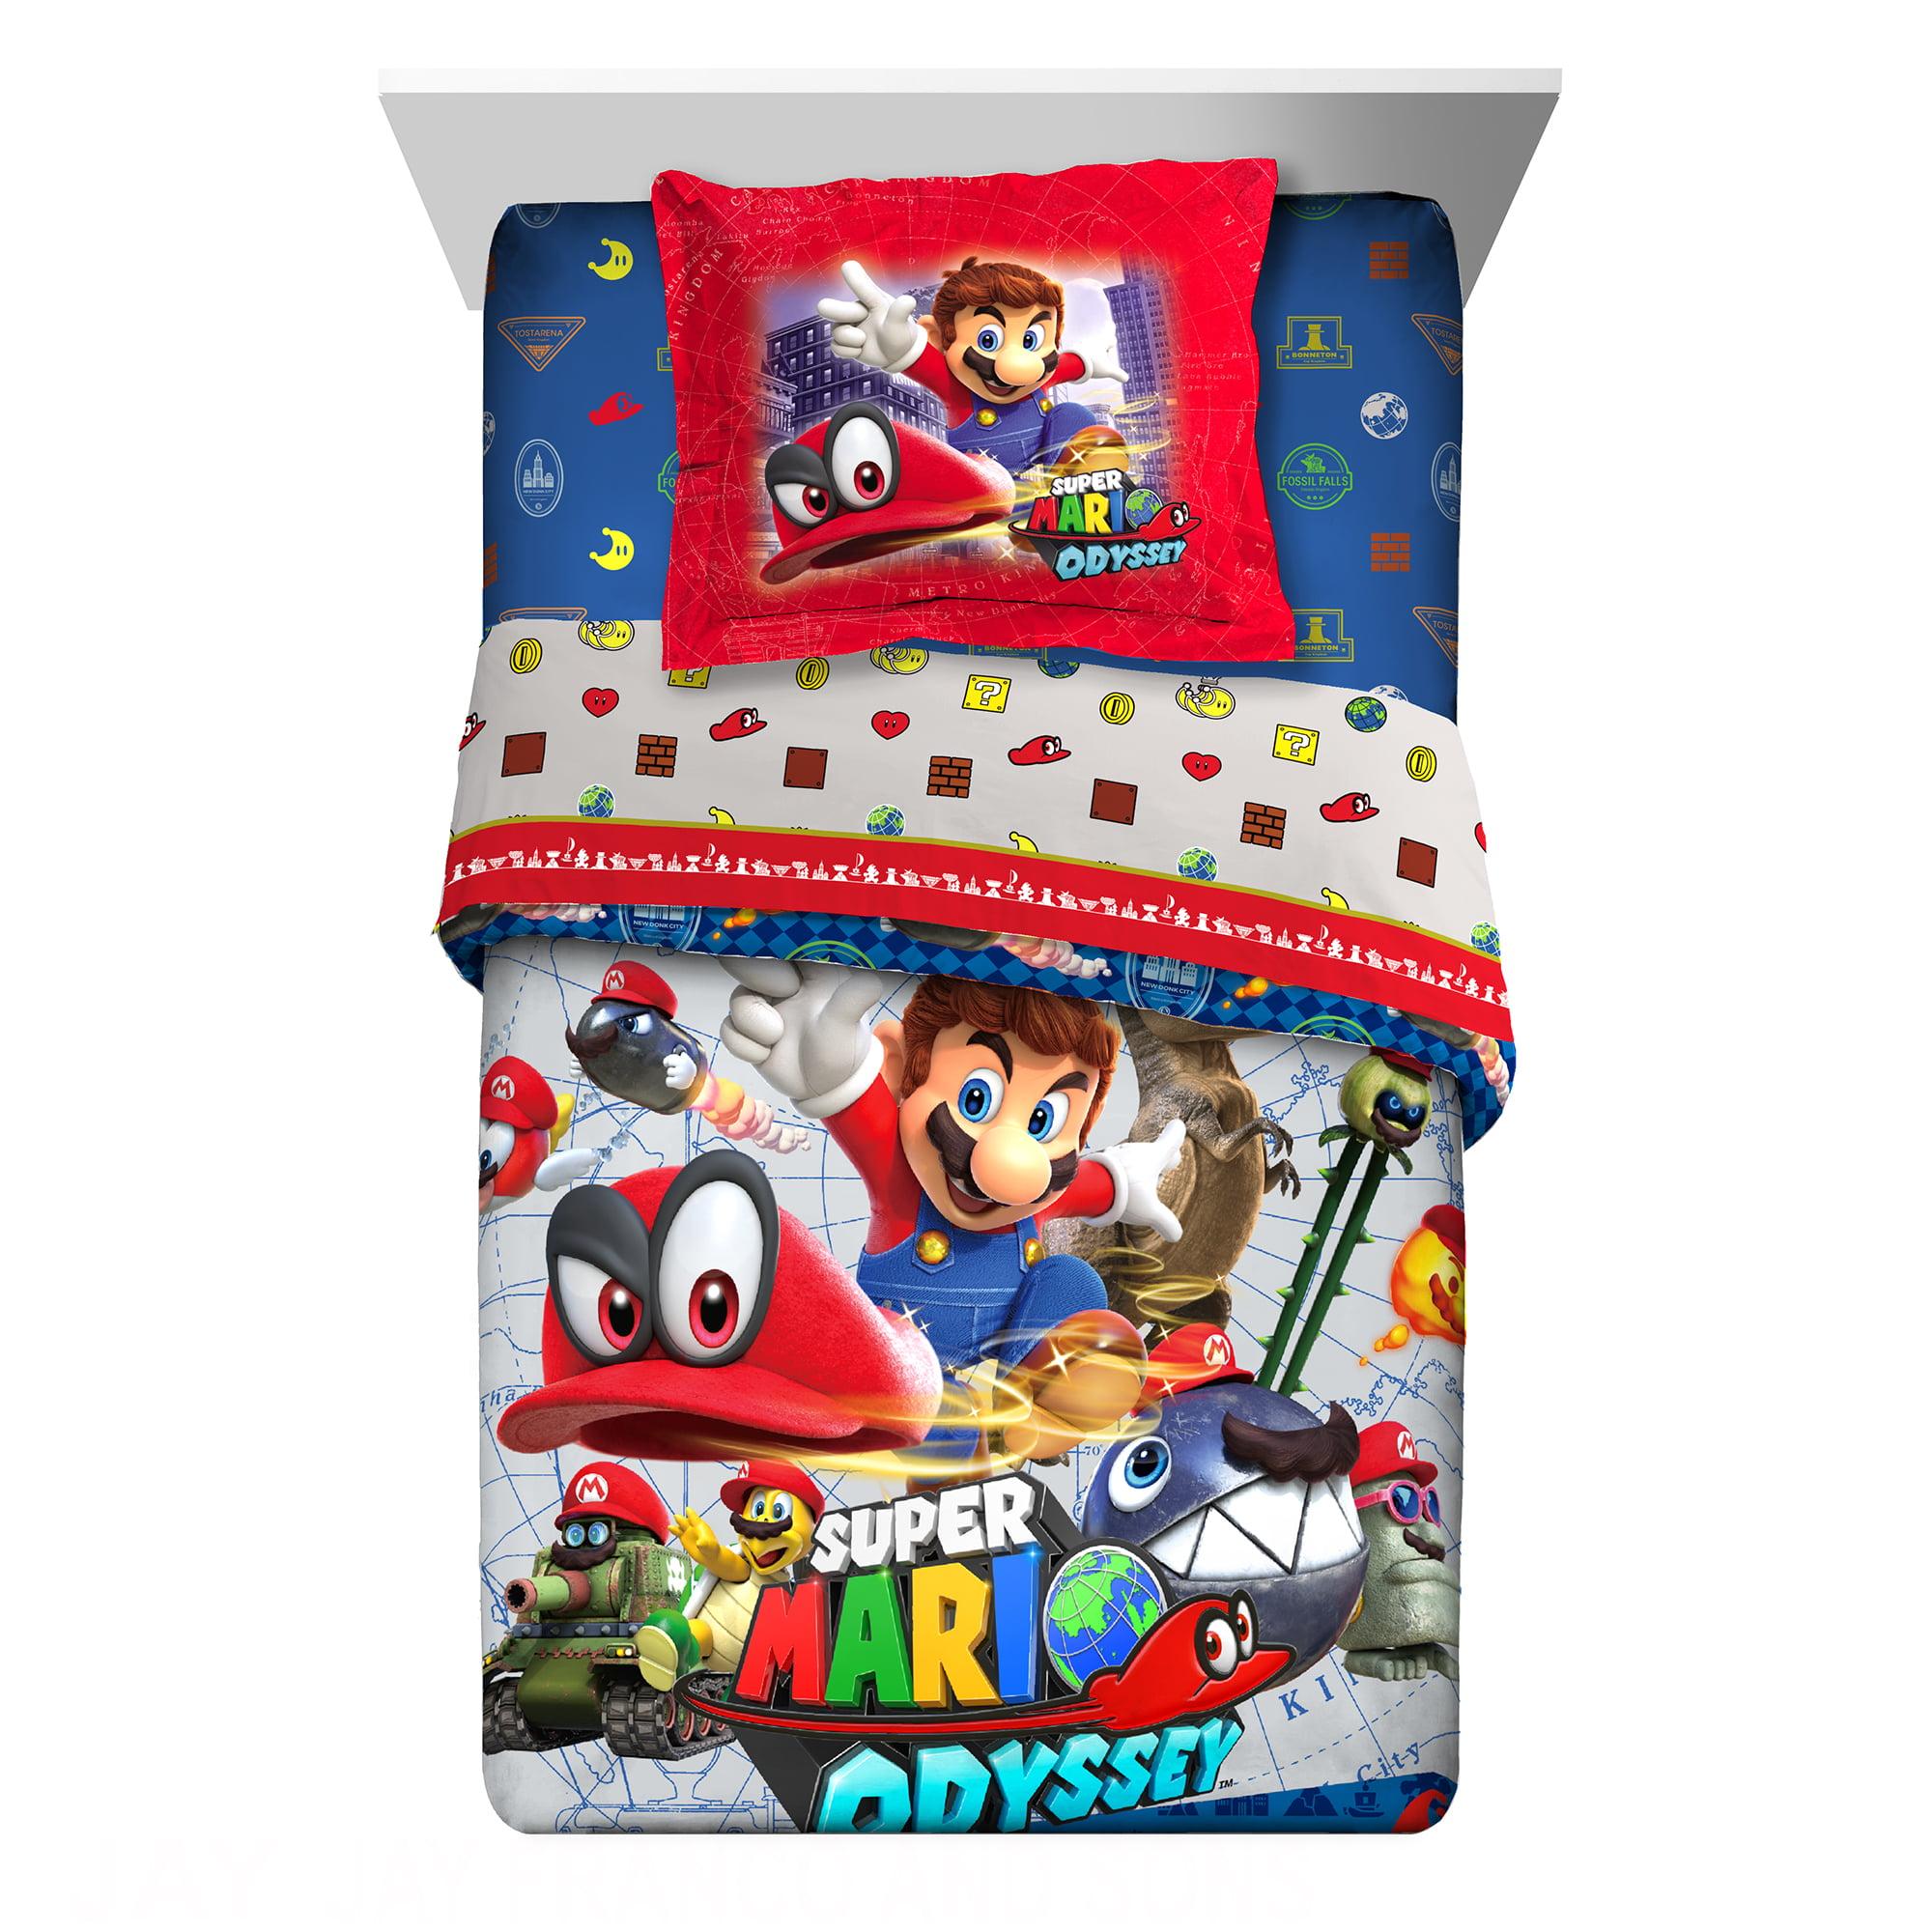 Nintendo Super Mario 'Odyssey Fun' 2 PC Kids Twin/Full Comforter with Sham